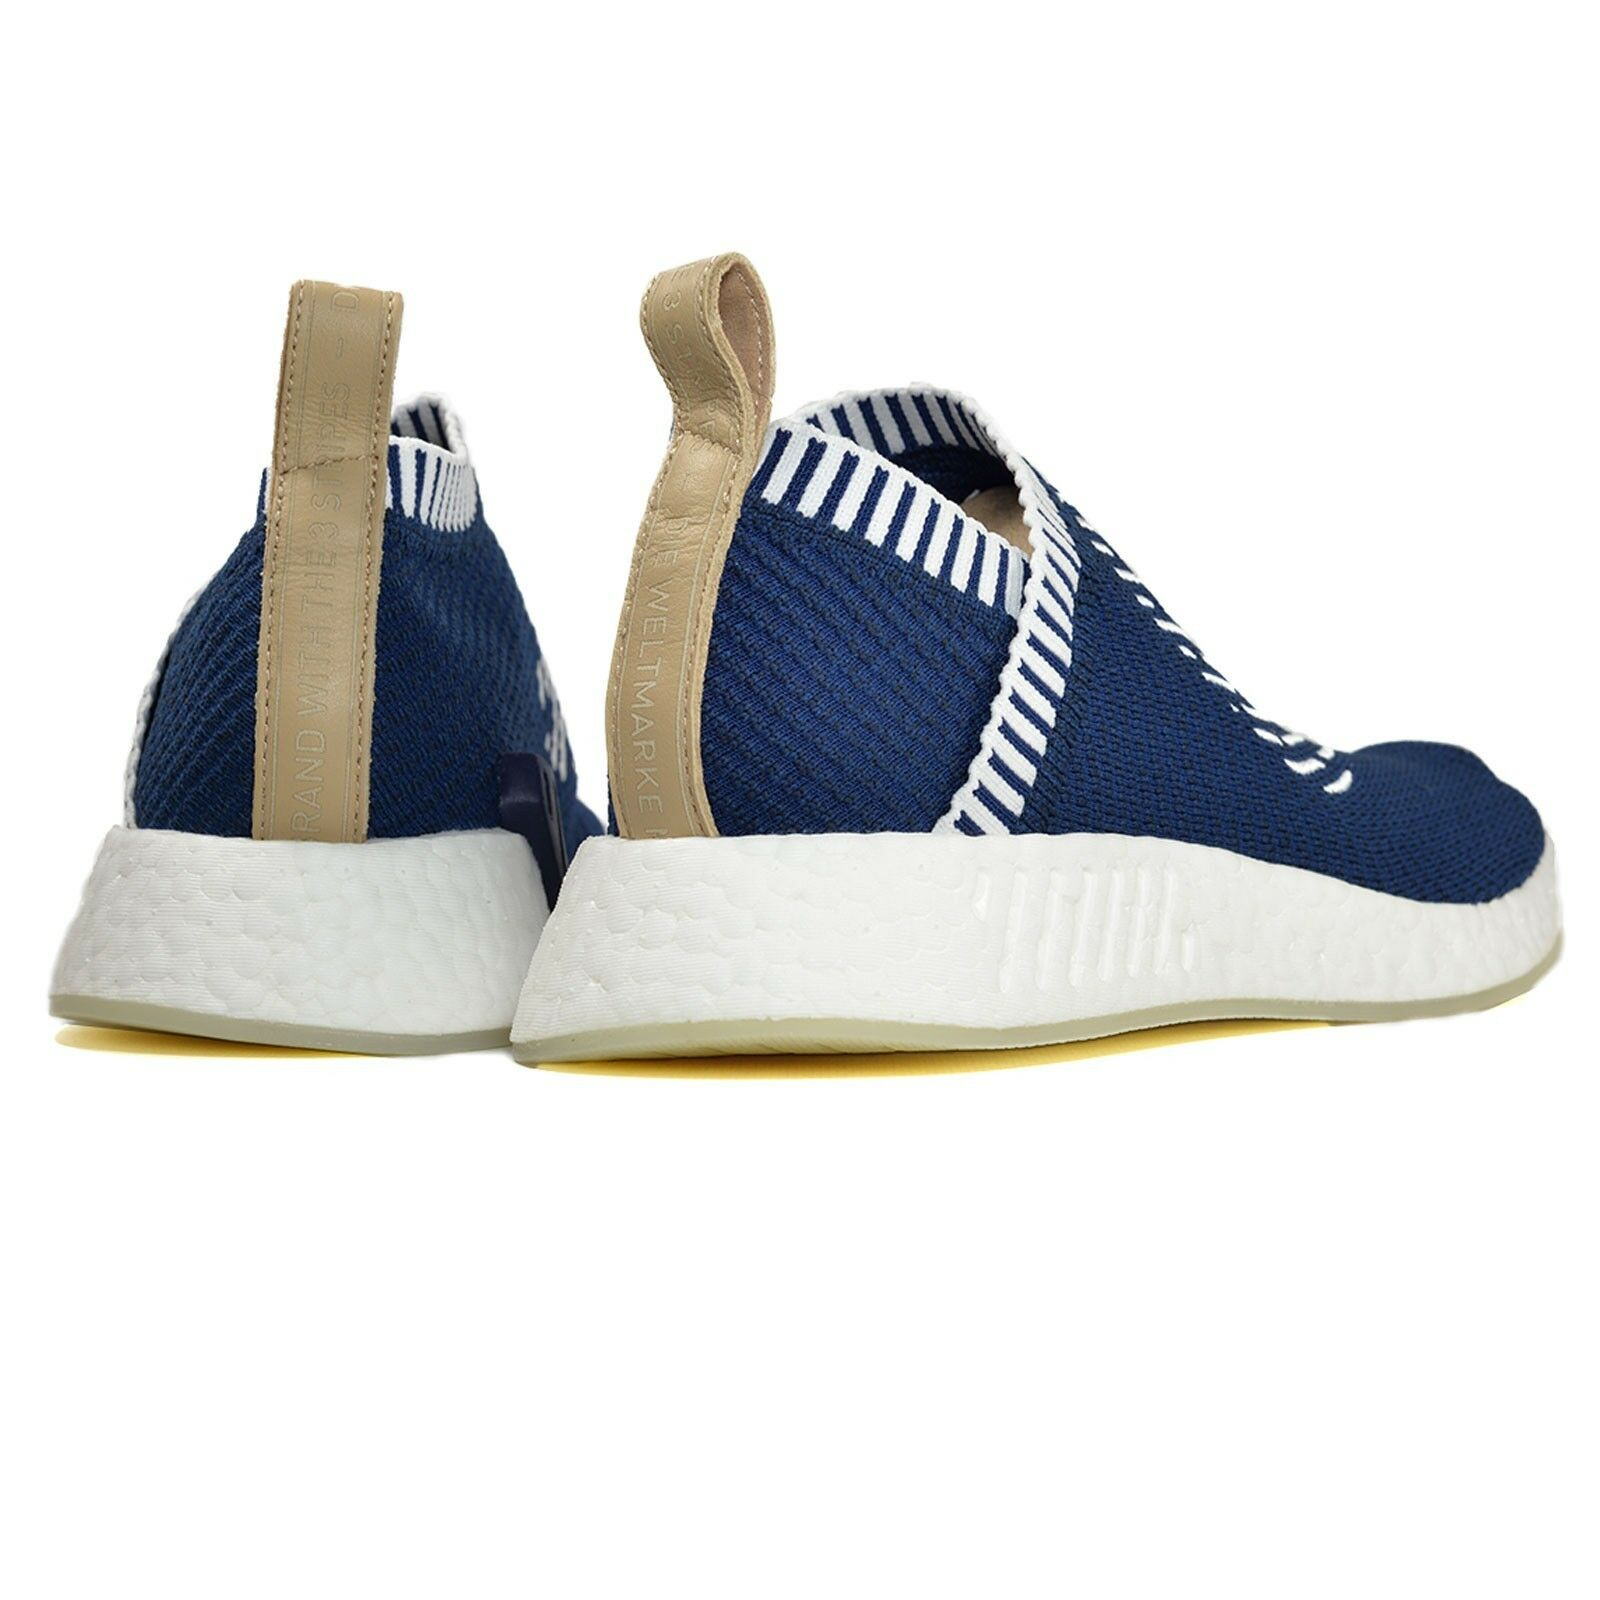 Adidas nmd cs2 pk ronin dimensioni 13,5.marina gomme bianche.ba7189 bianche.ba7189 gomme citt sock.ultra impulso 18f84f